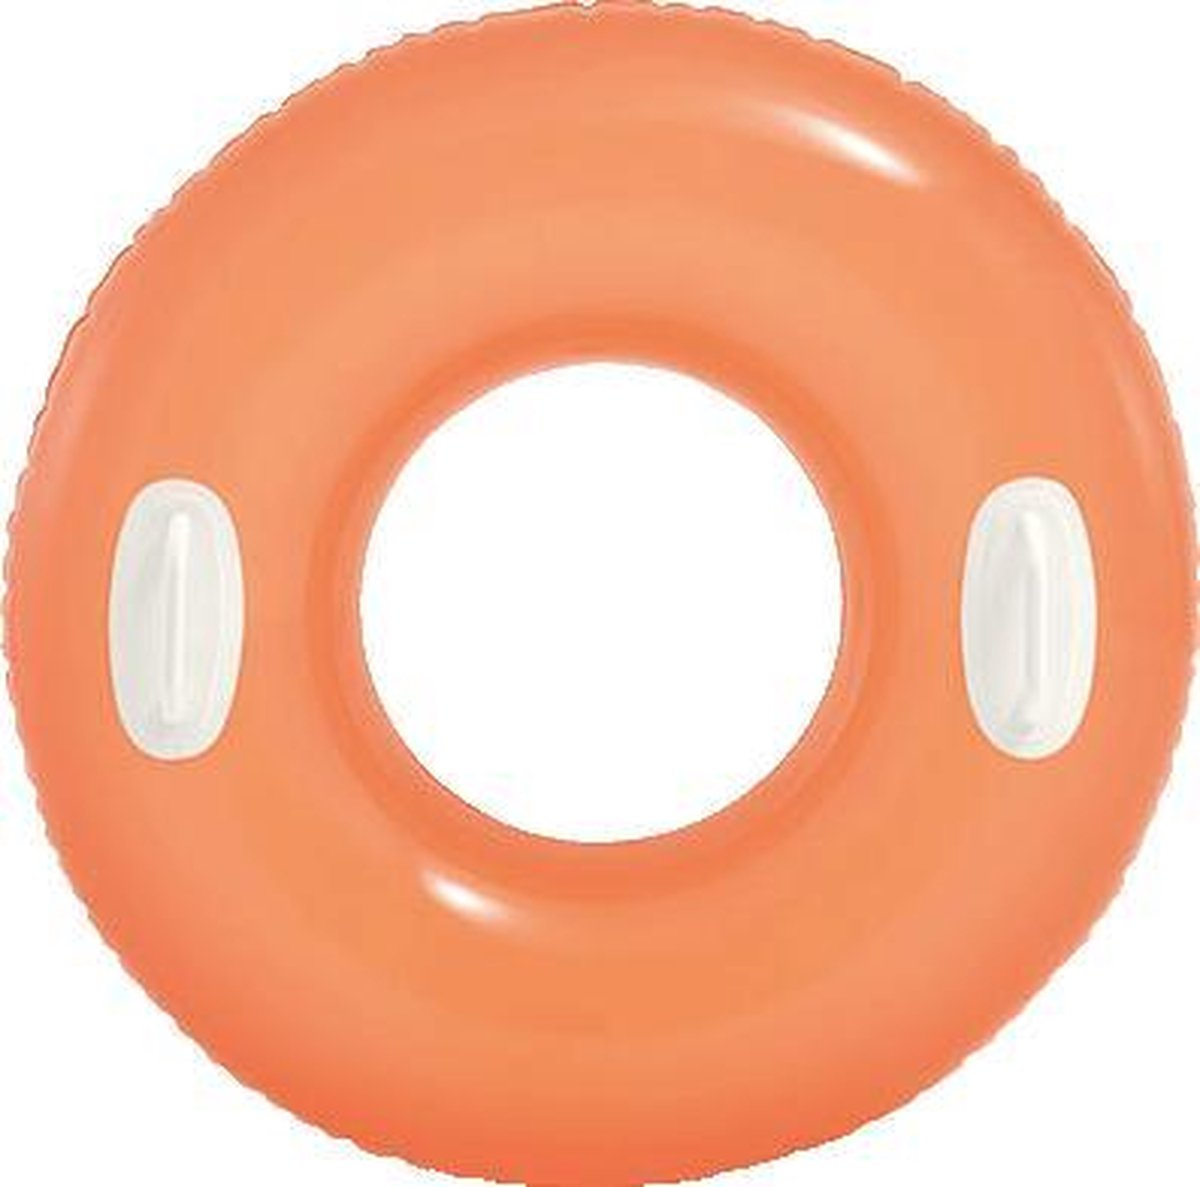 Opblaas zwemband Basic 76 cm - oranje